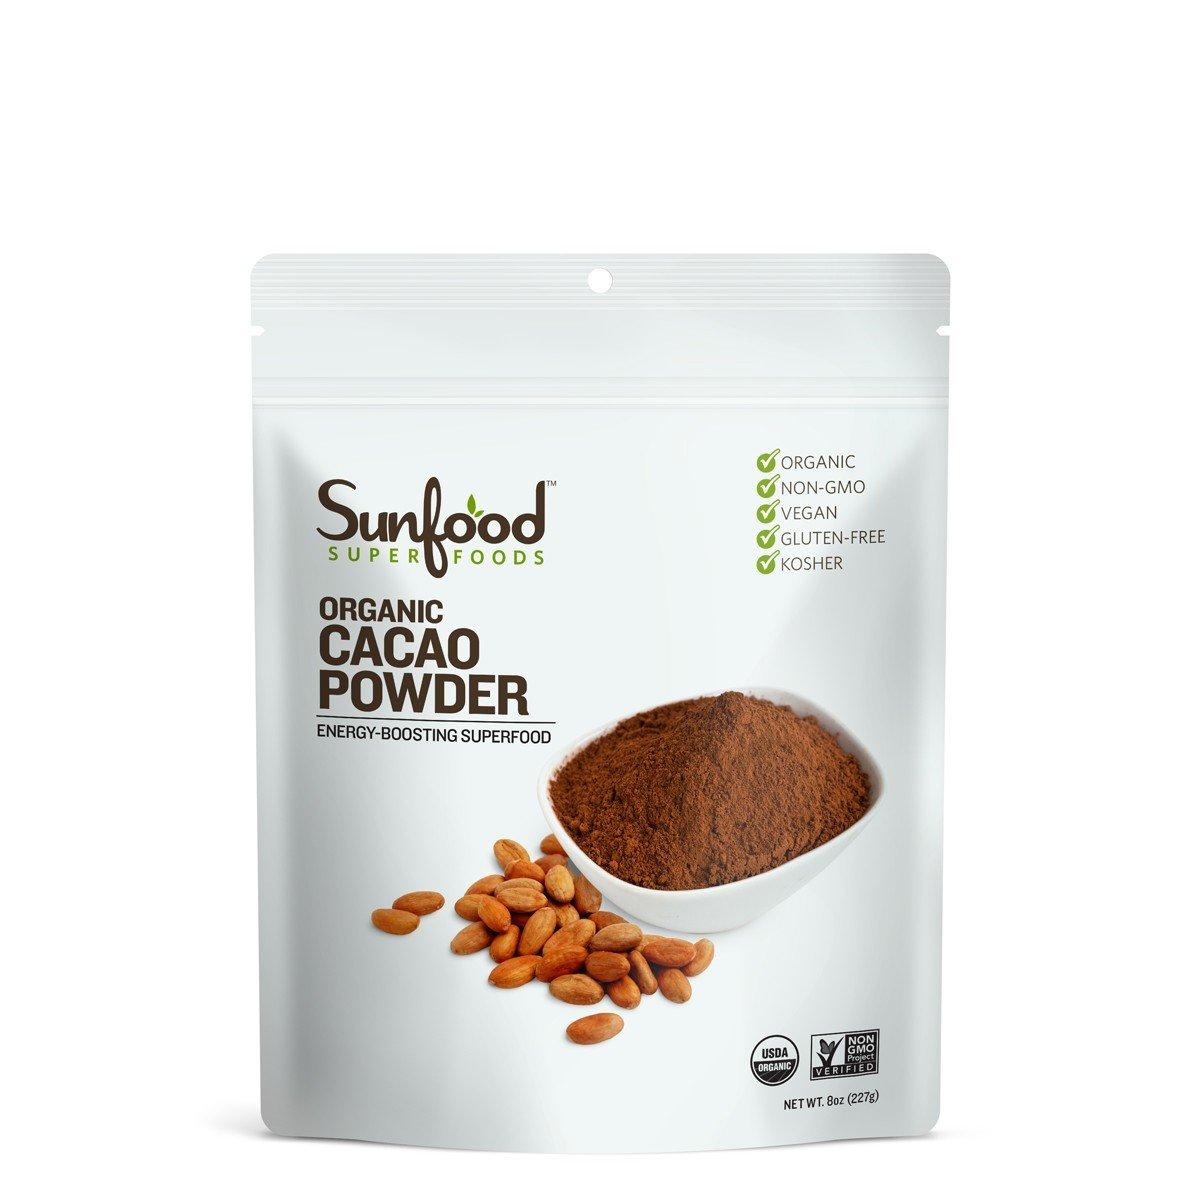 Sunfood Cacao Powder, 8 Ounces, Organic